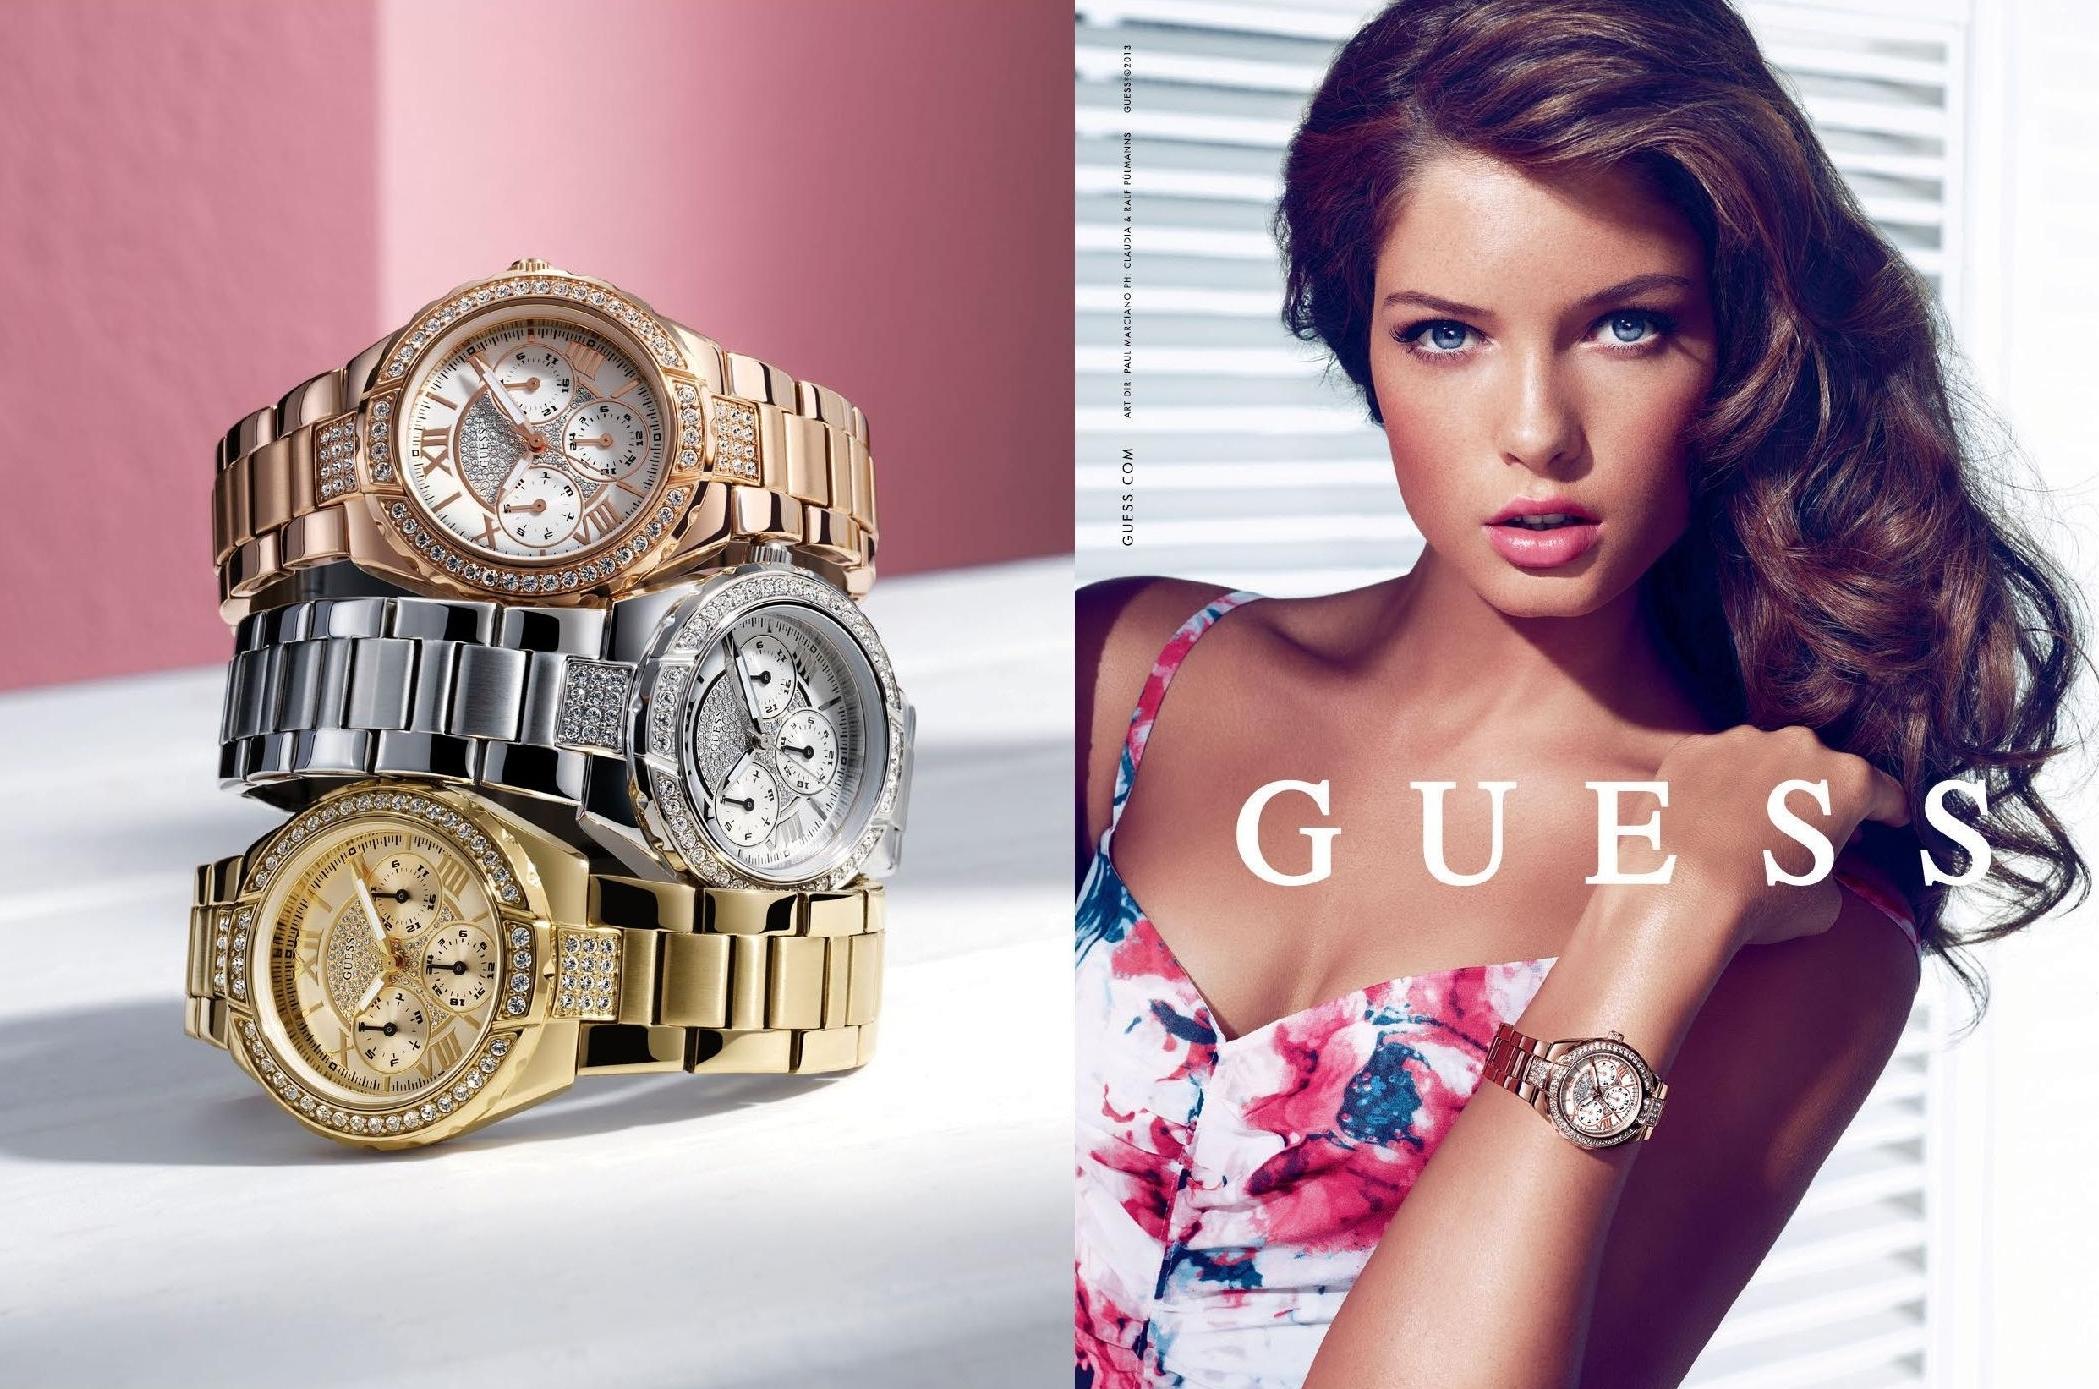 Guess Publicidad Publicidad Relojes Publicidad Guess Publicidad Relojes Guess Relojes Relojes rCBeWdox